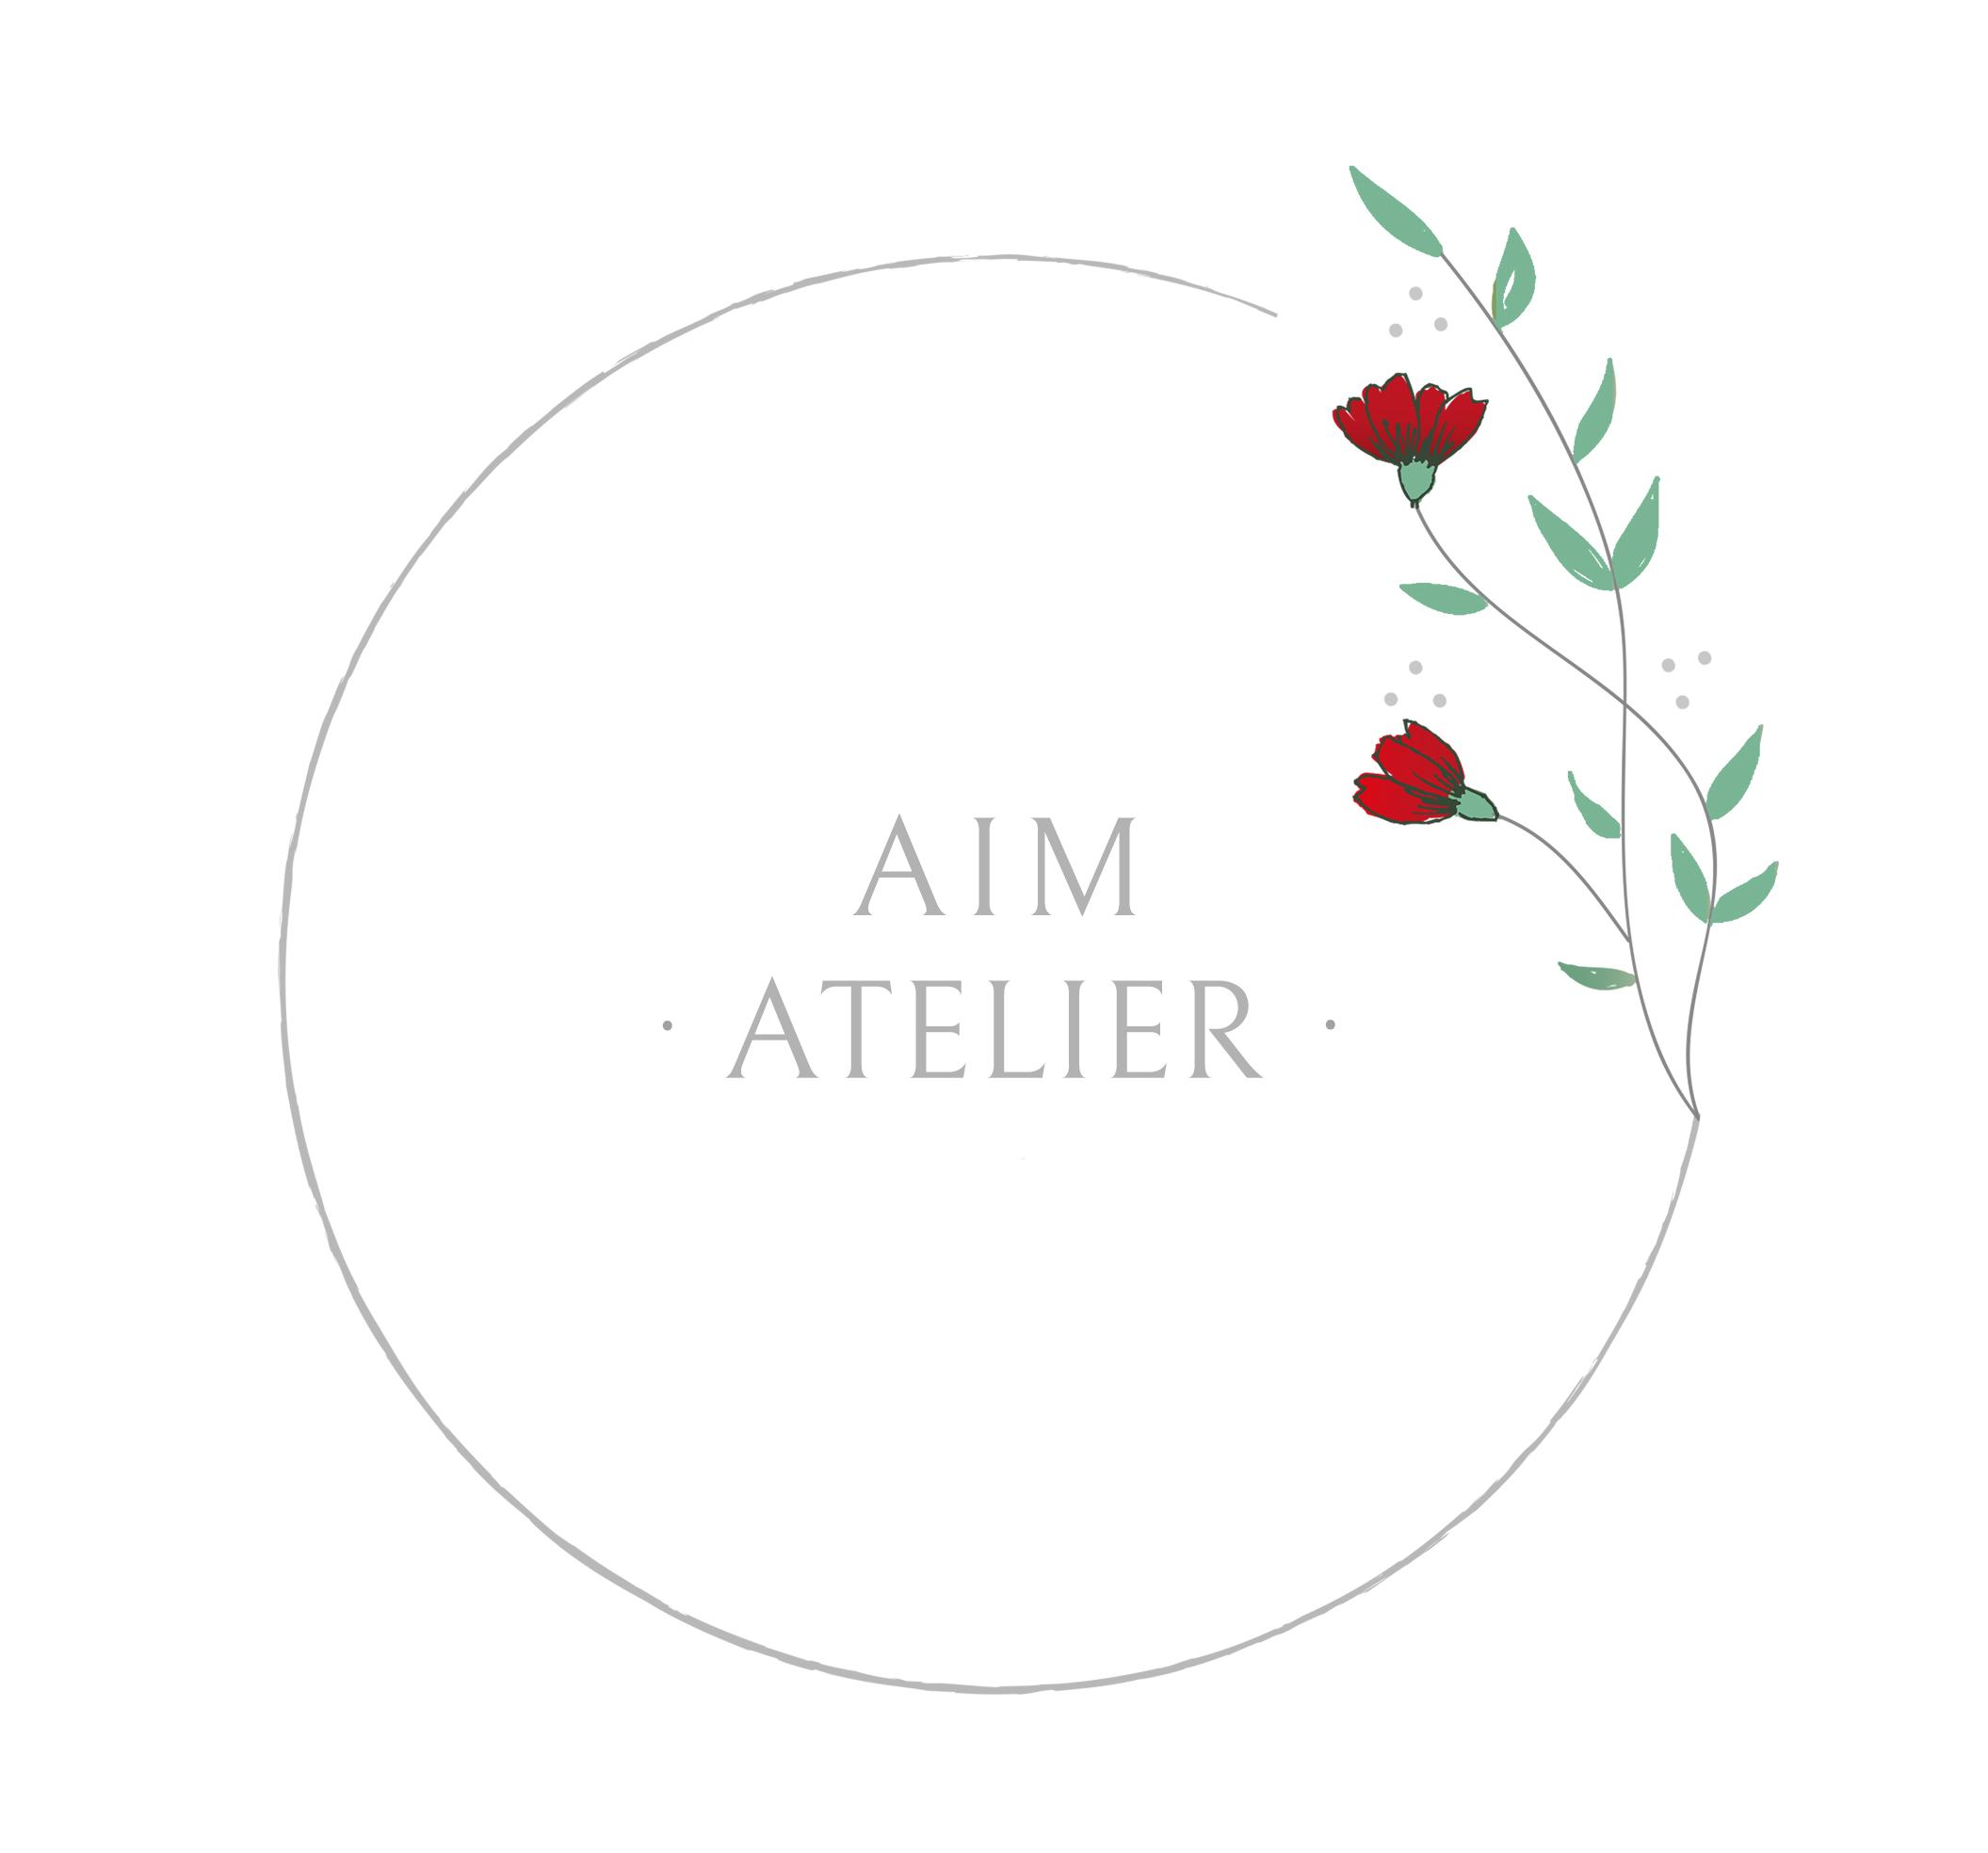 Aim Atelier